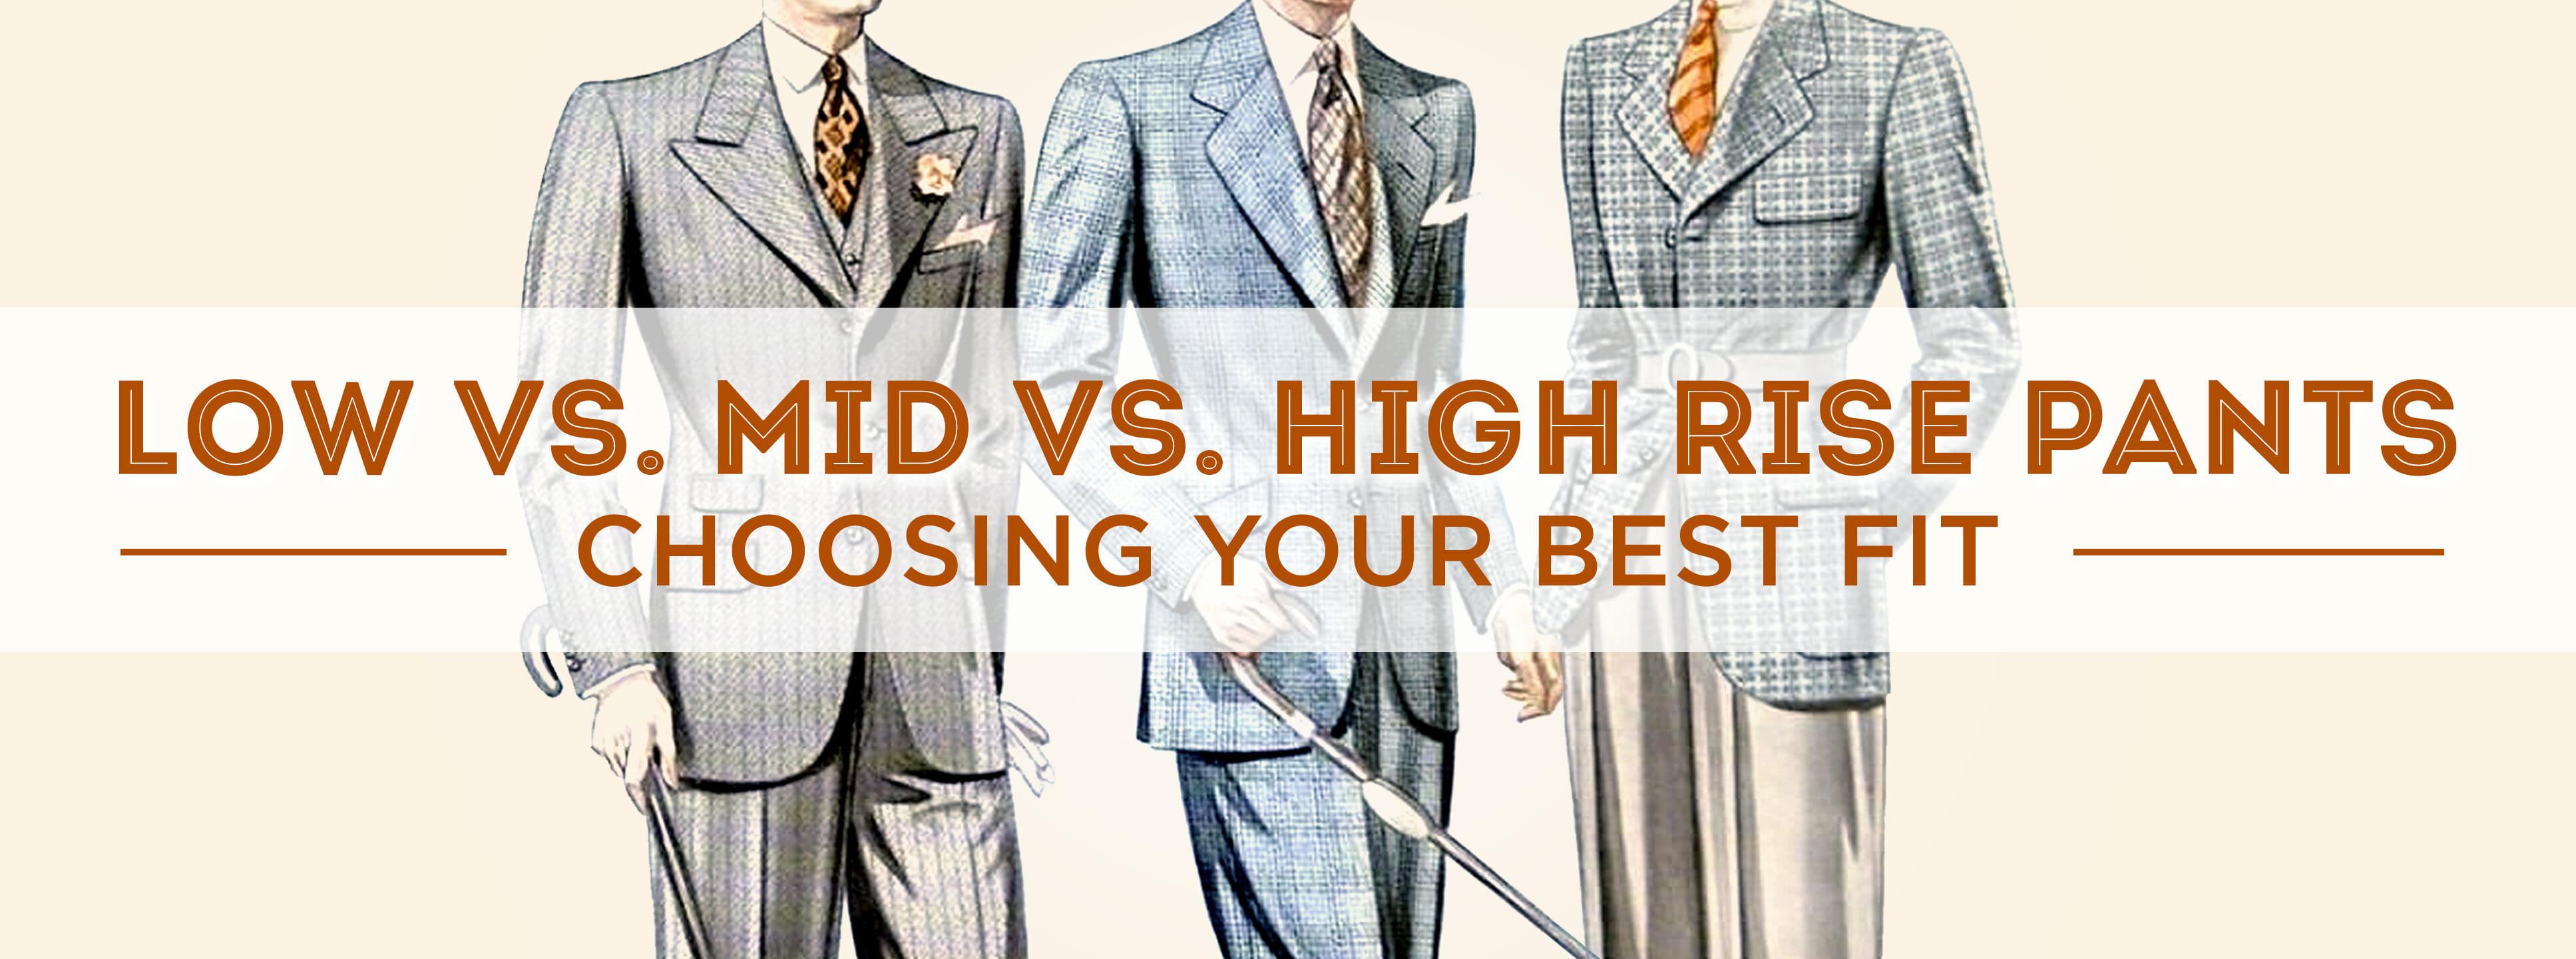 2997f976c Should You Wear High-Waisted Pants? — Gentleman's Gazette